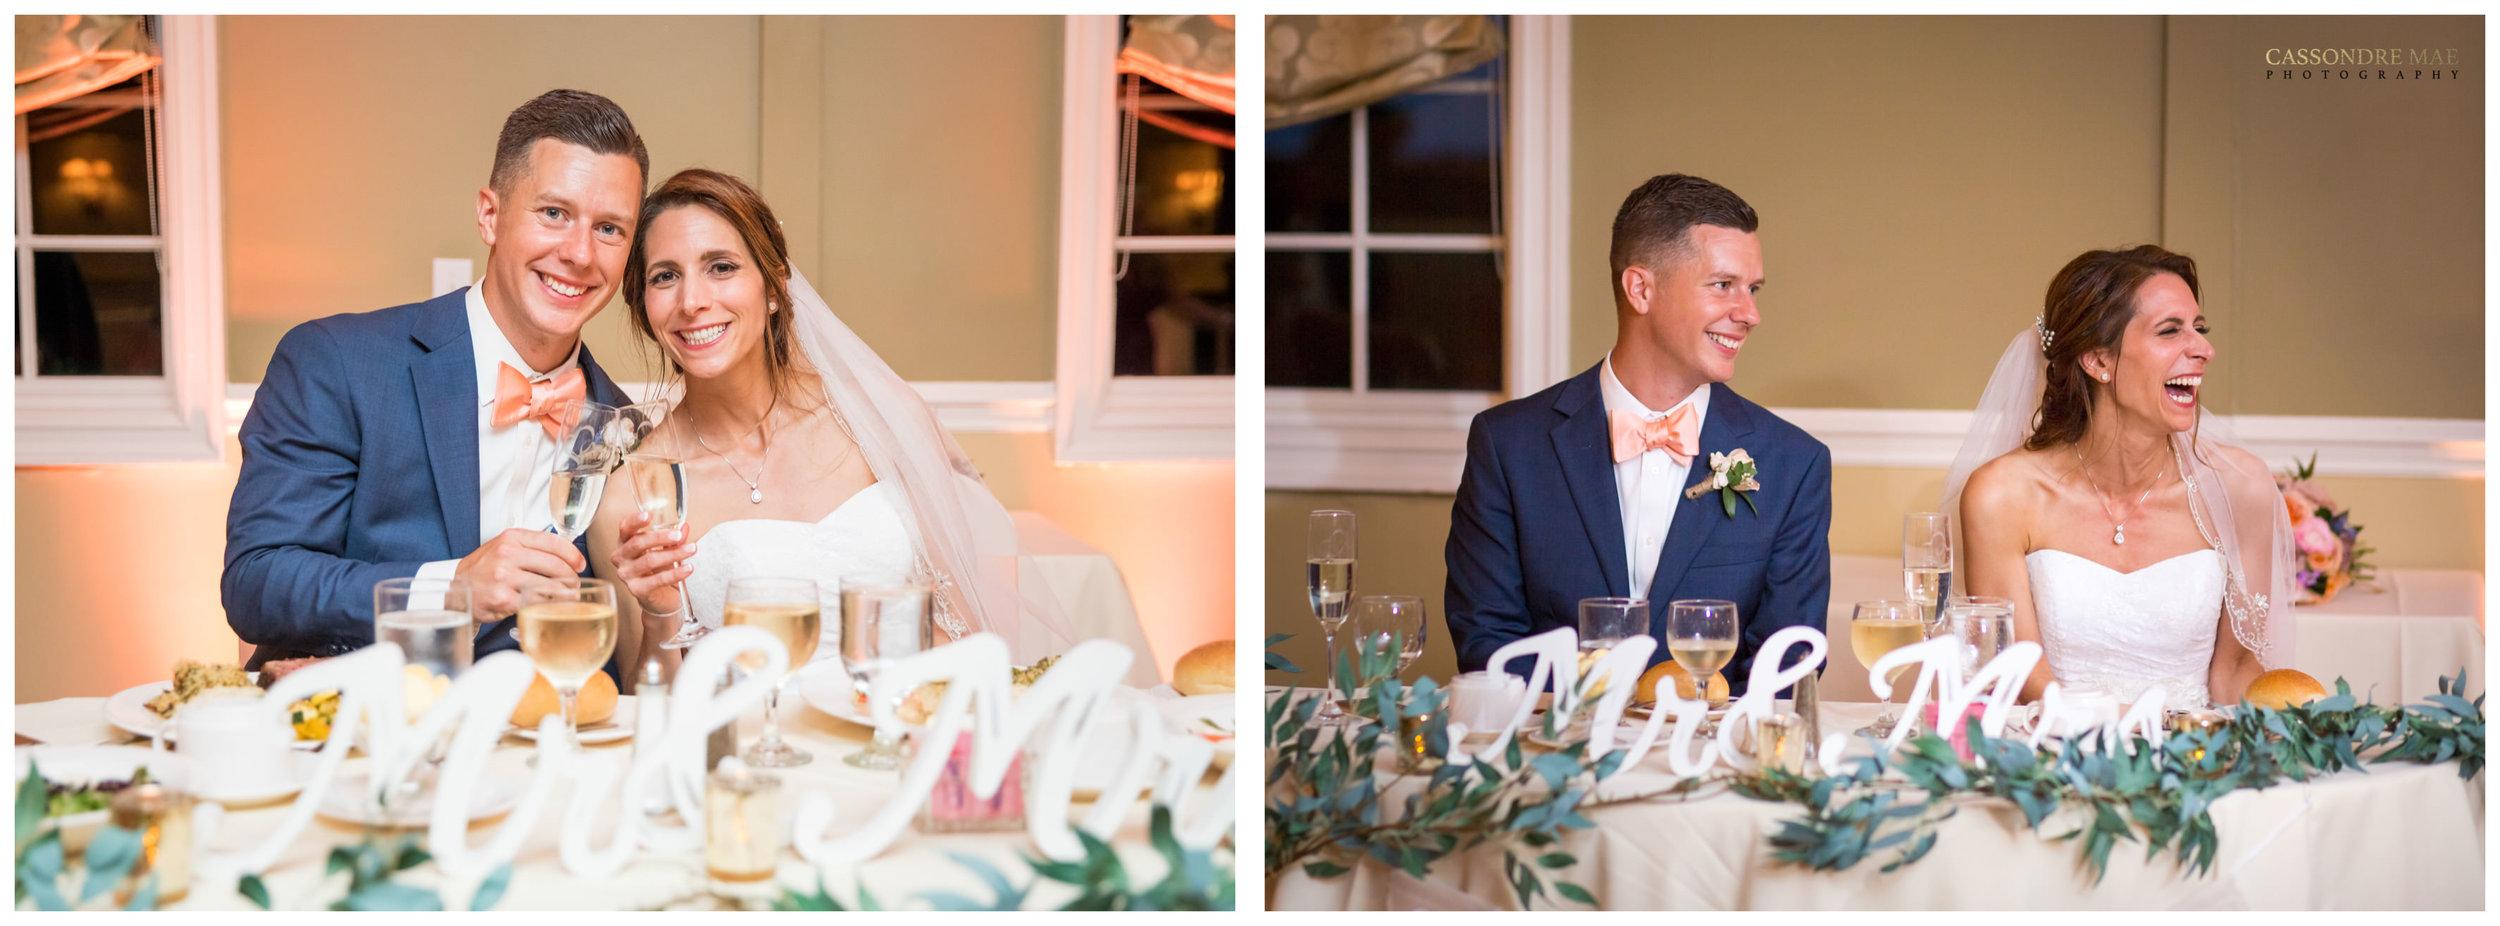 Cassondre Mae Photography Links at Unionvale Wedding 21.jpg